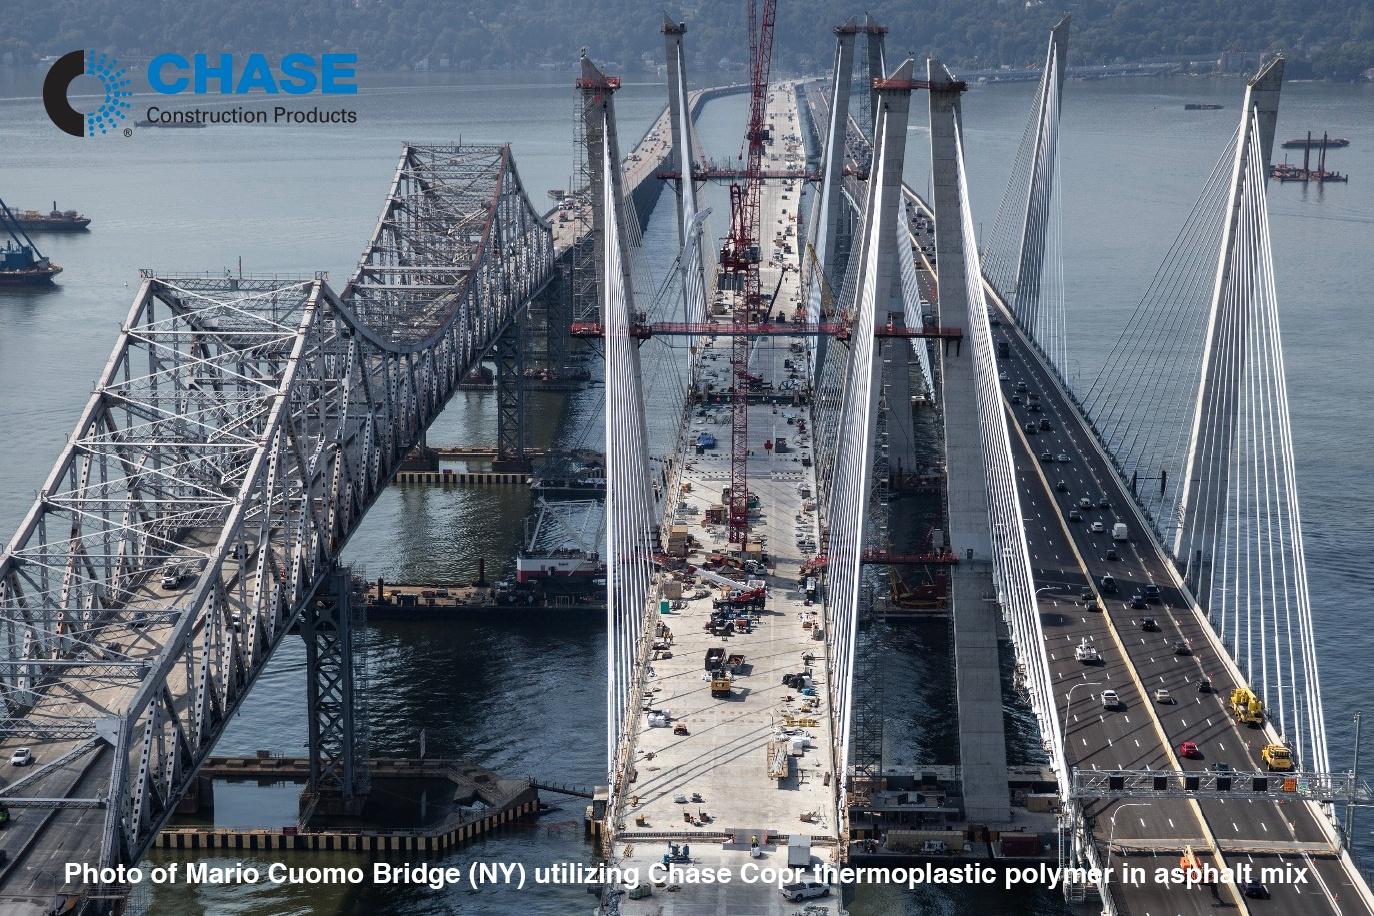 Photo of Mario Cuomo Bridge (NY) utilizing Chase Corporation thermoplastic polymer in asphalt mix.jpg